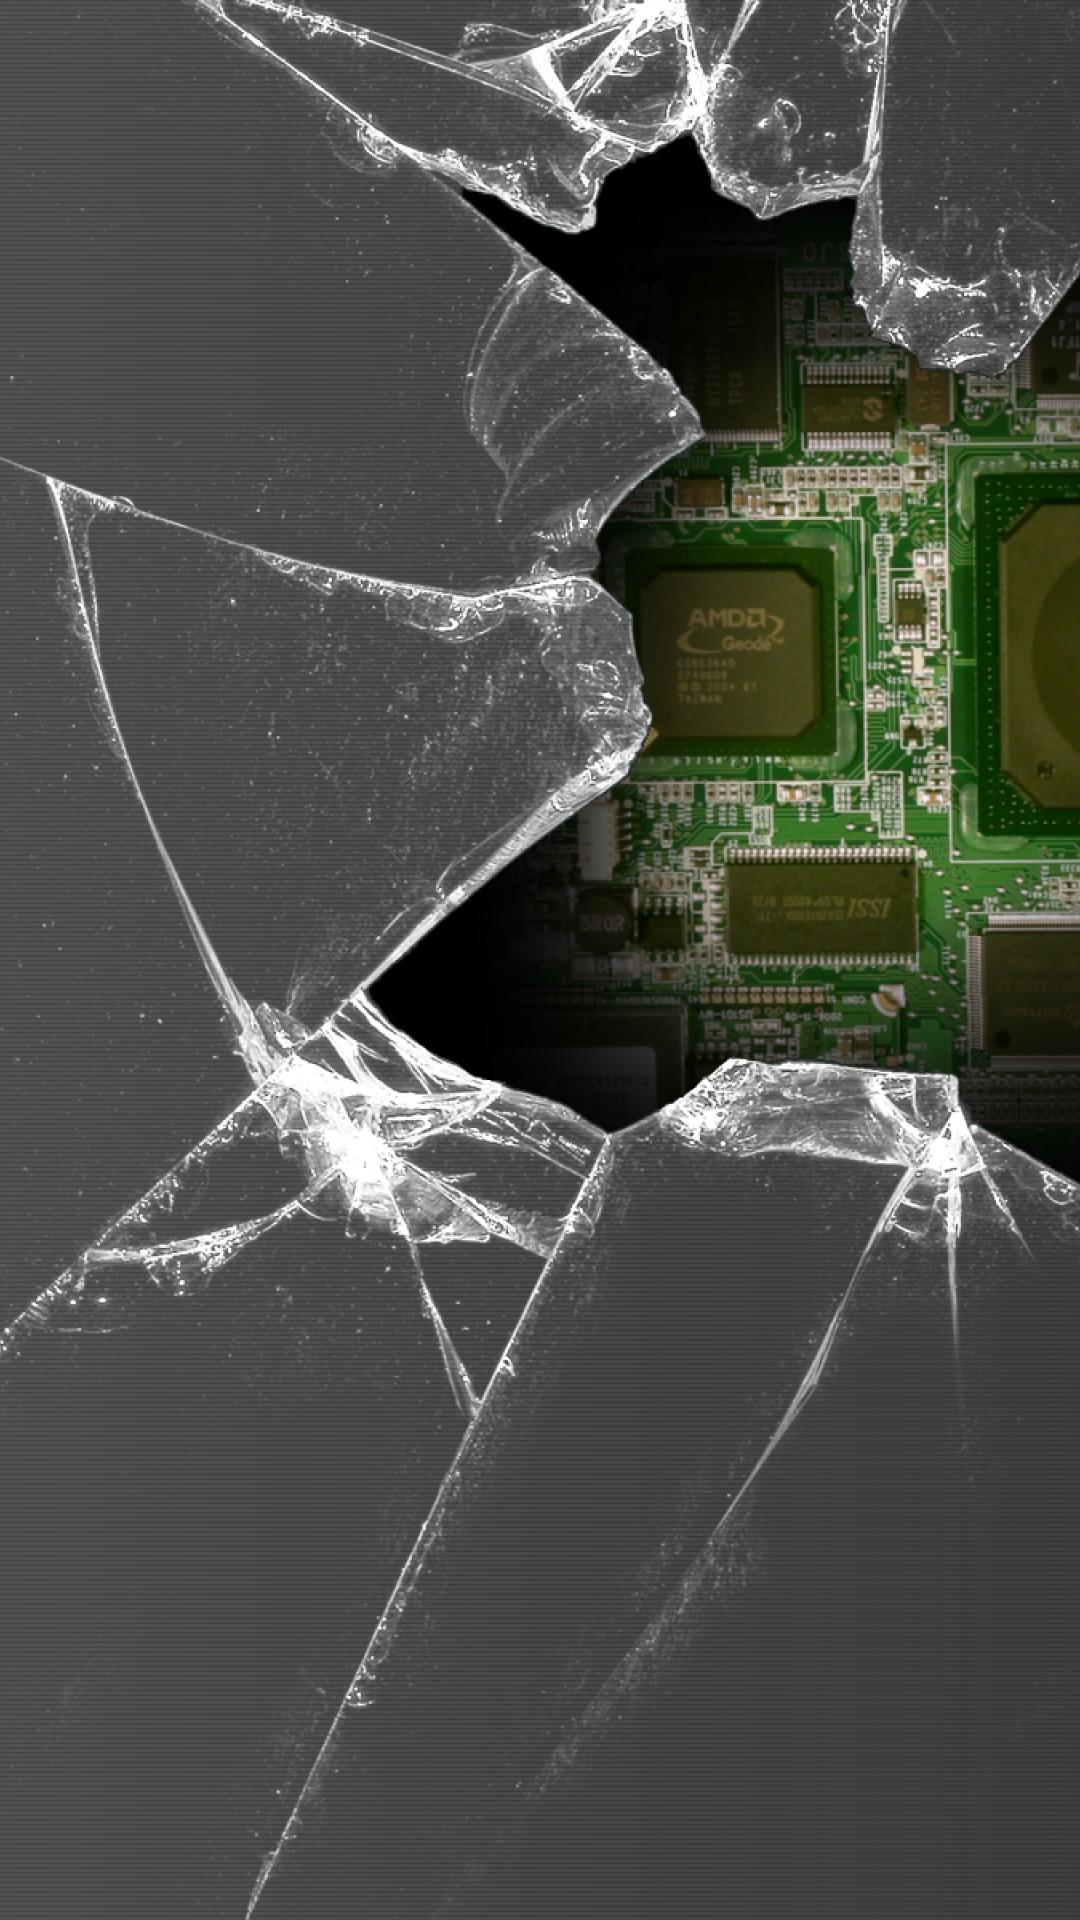 Cracked iPhone in 2020 Cracked iphone, Iphone wallpaper